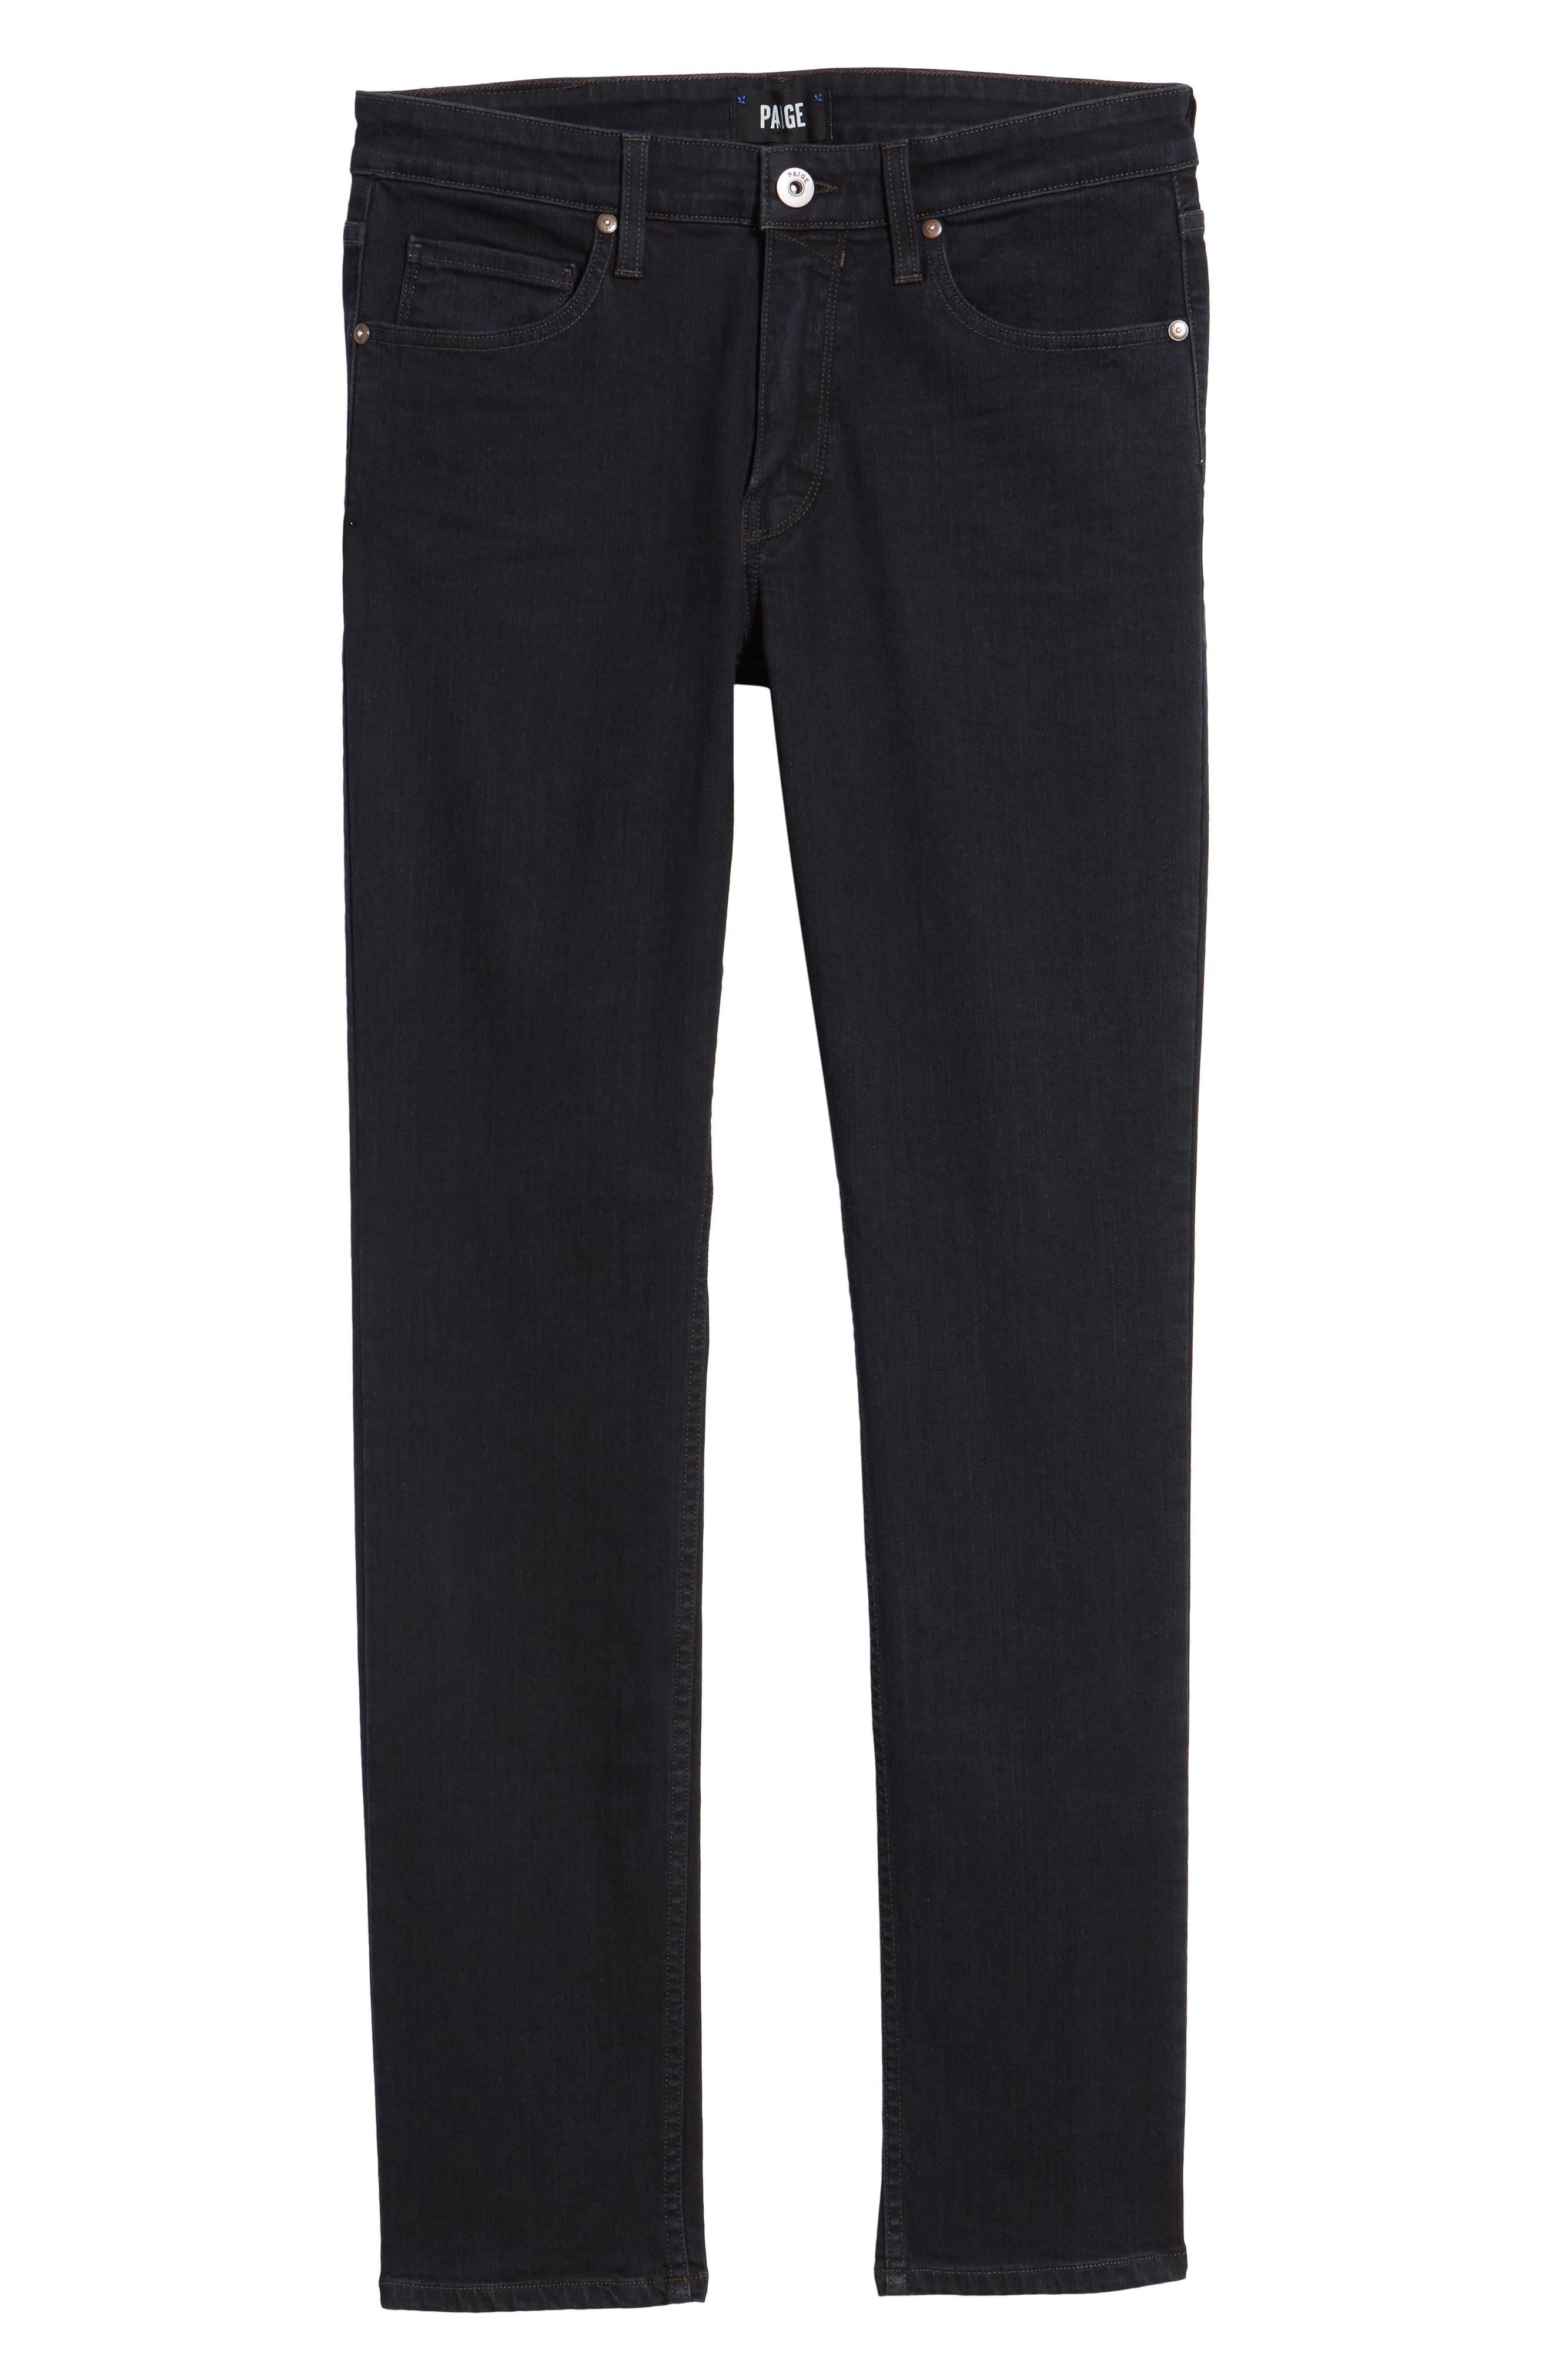 Lennox Slim Fit Jeans,                         Main,                         color, Tommy